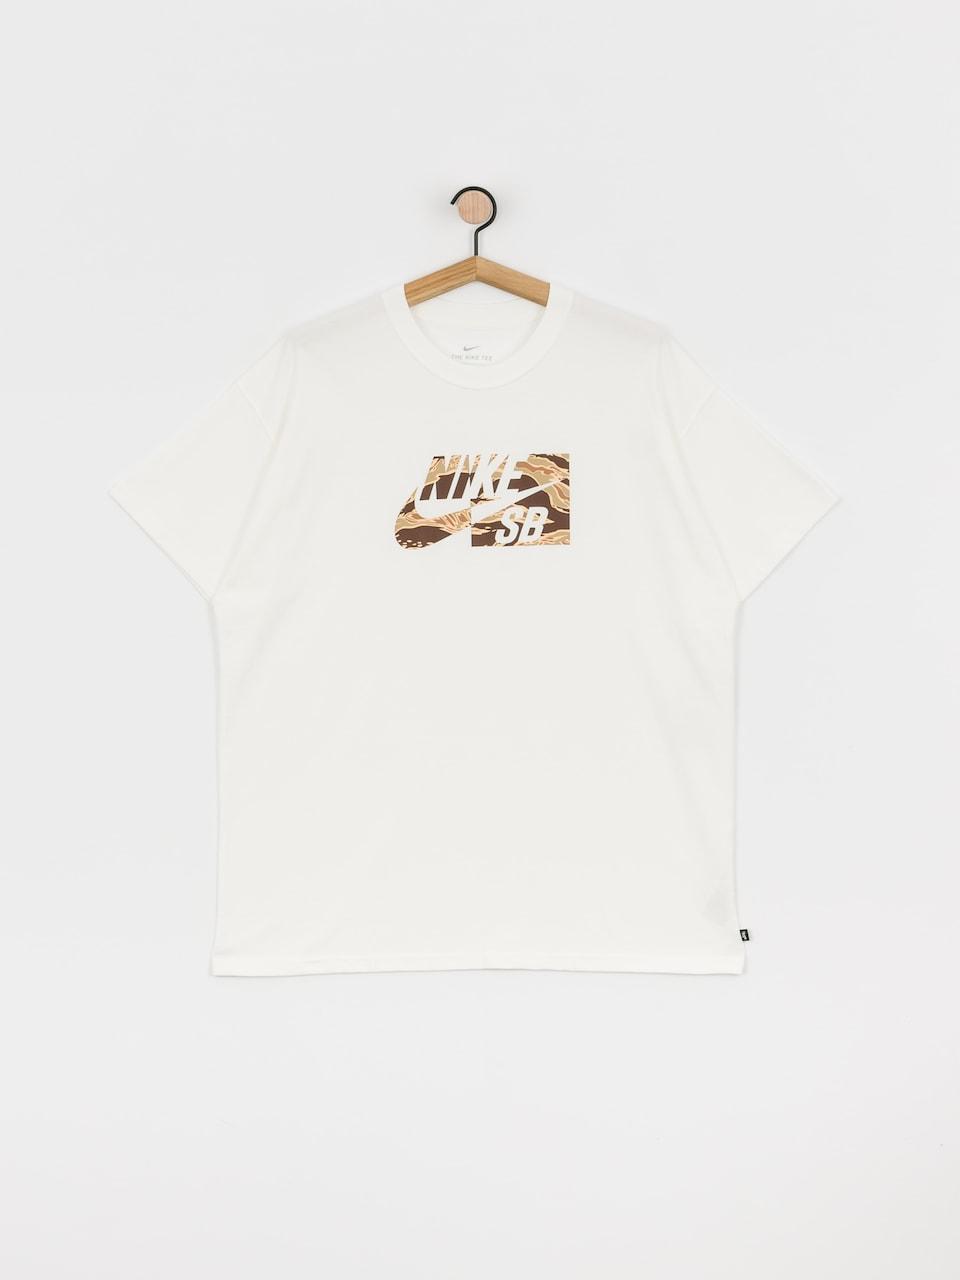 Clothing Nike SB men | SUPER SHOP